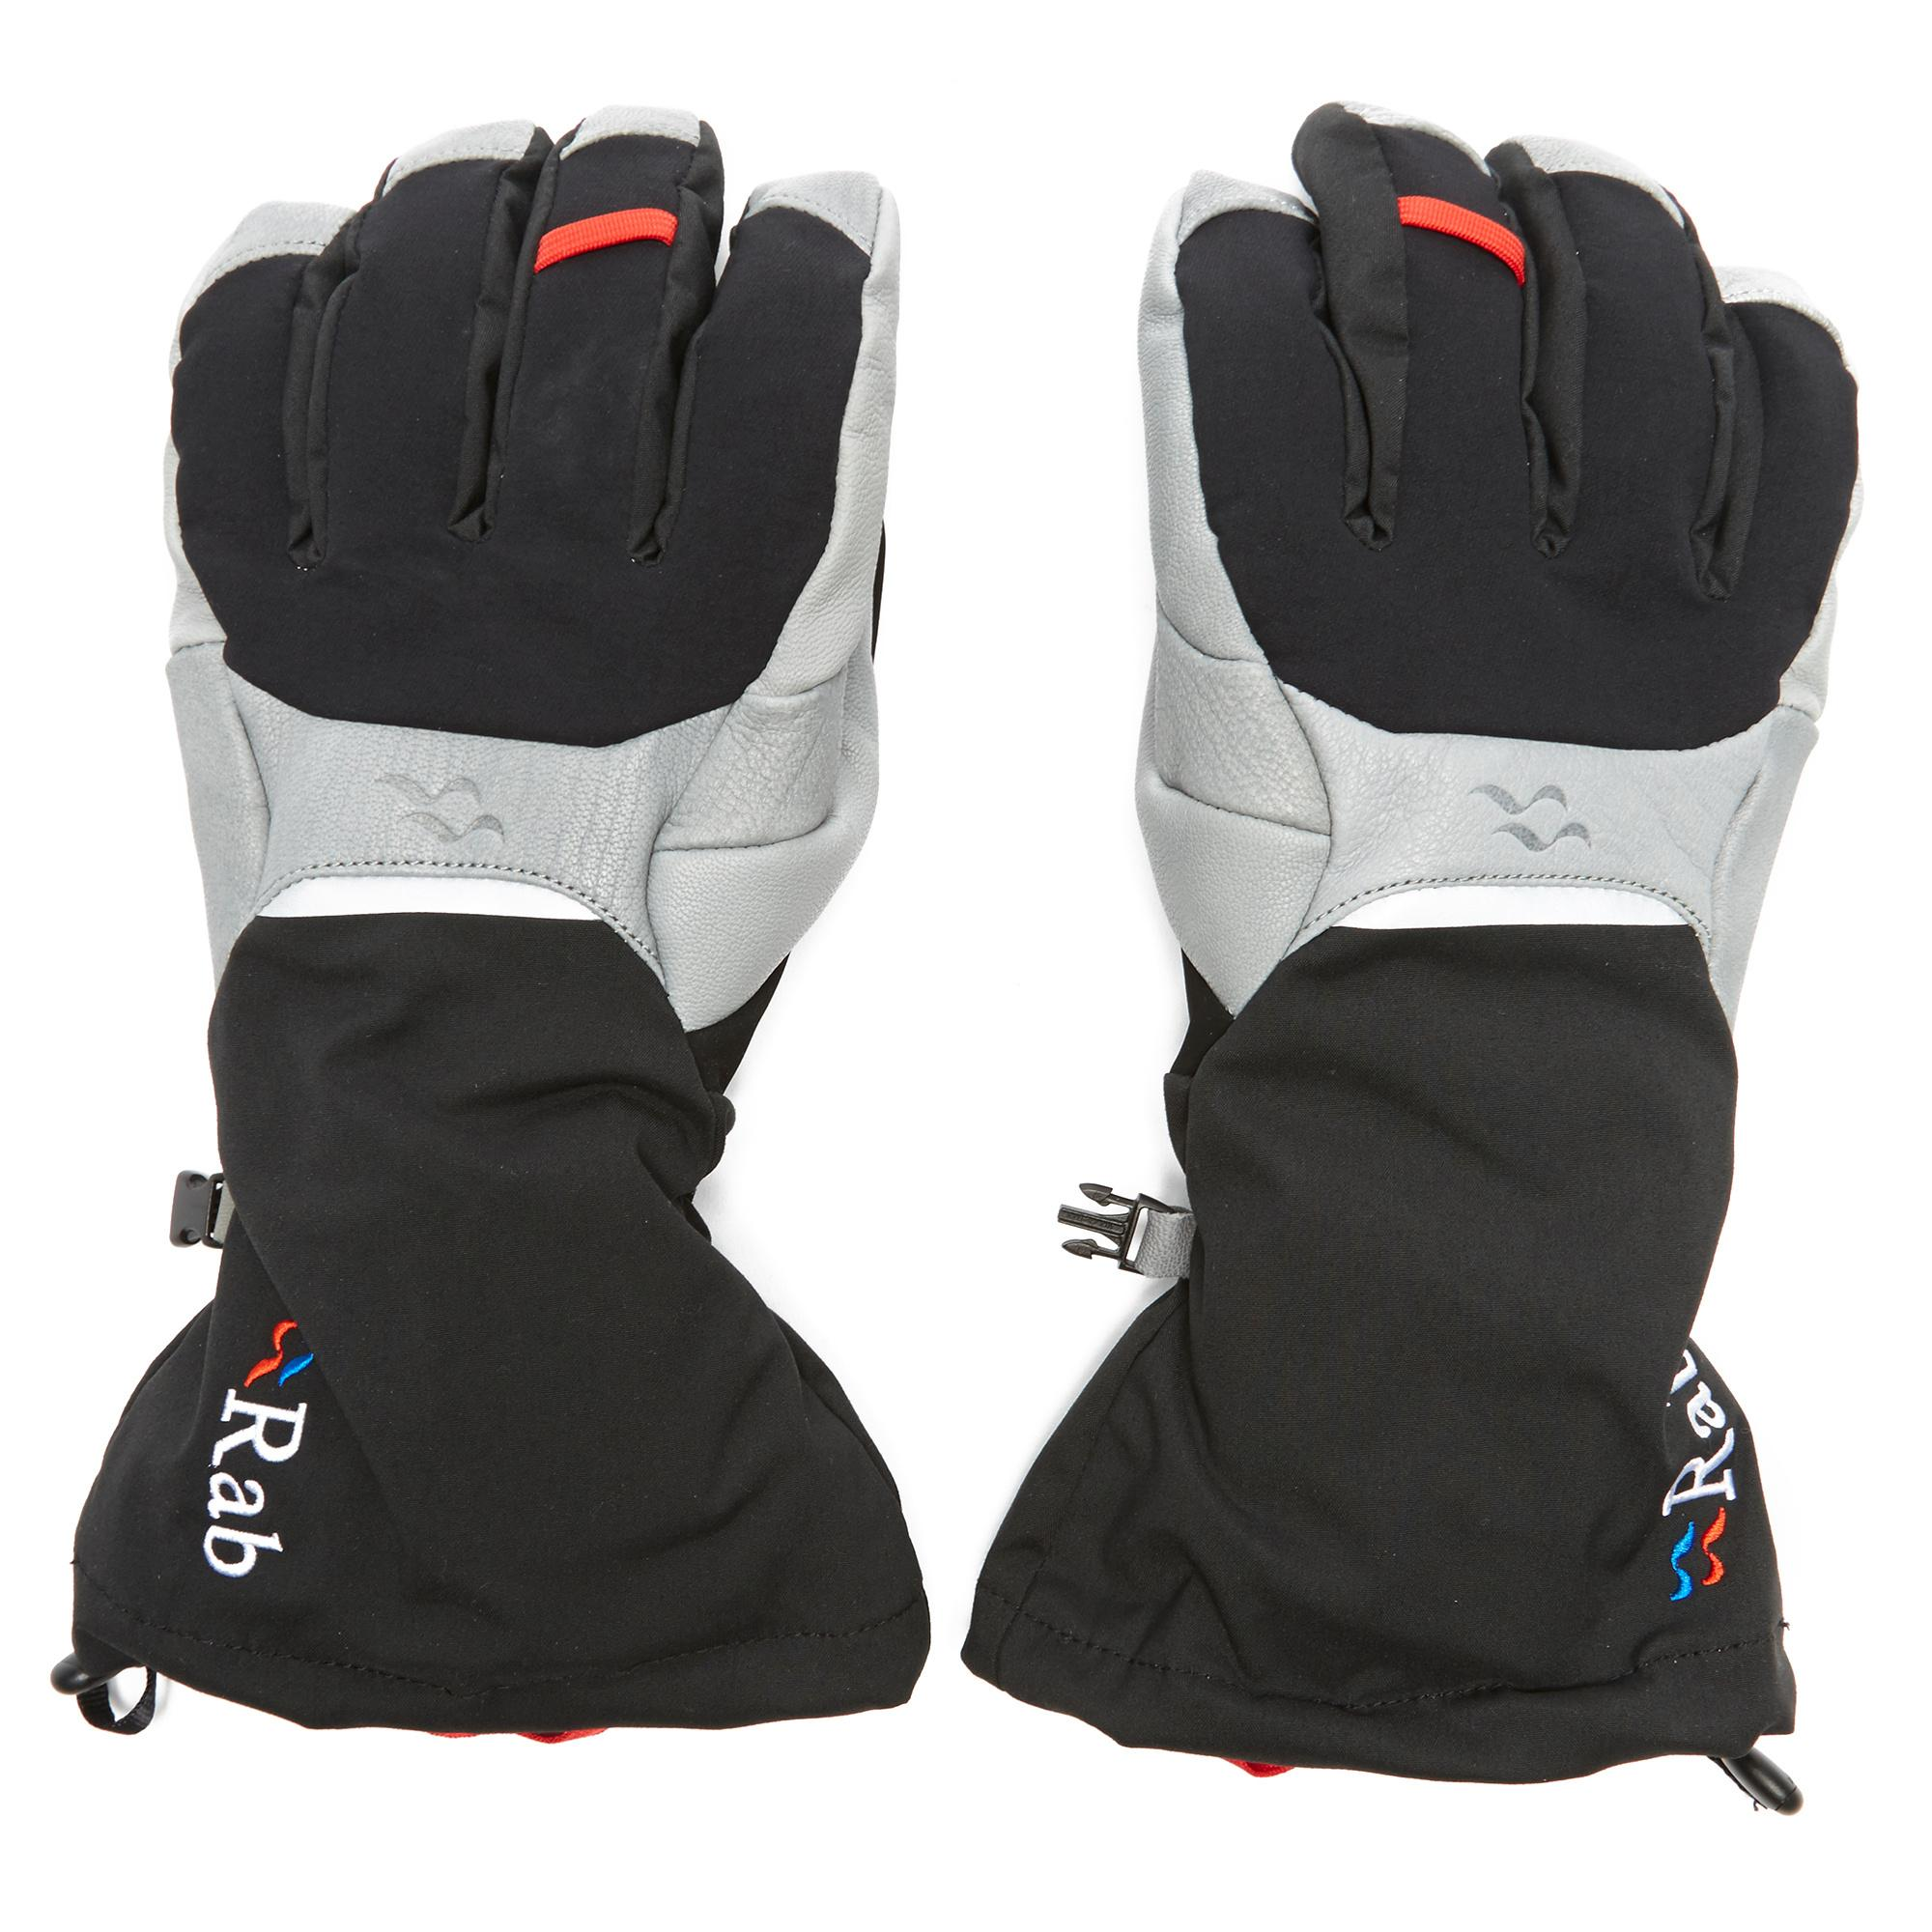 Rab Alliance 3 in 1 Glove - Black, Black